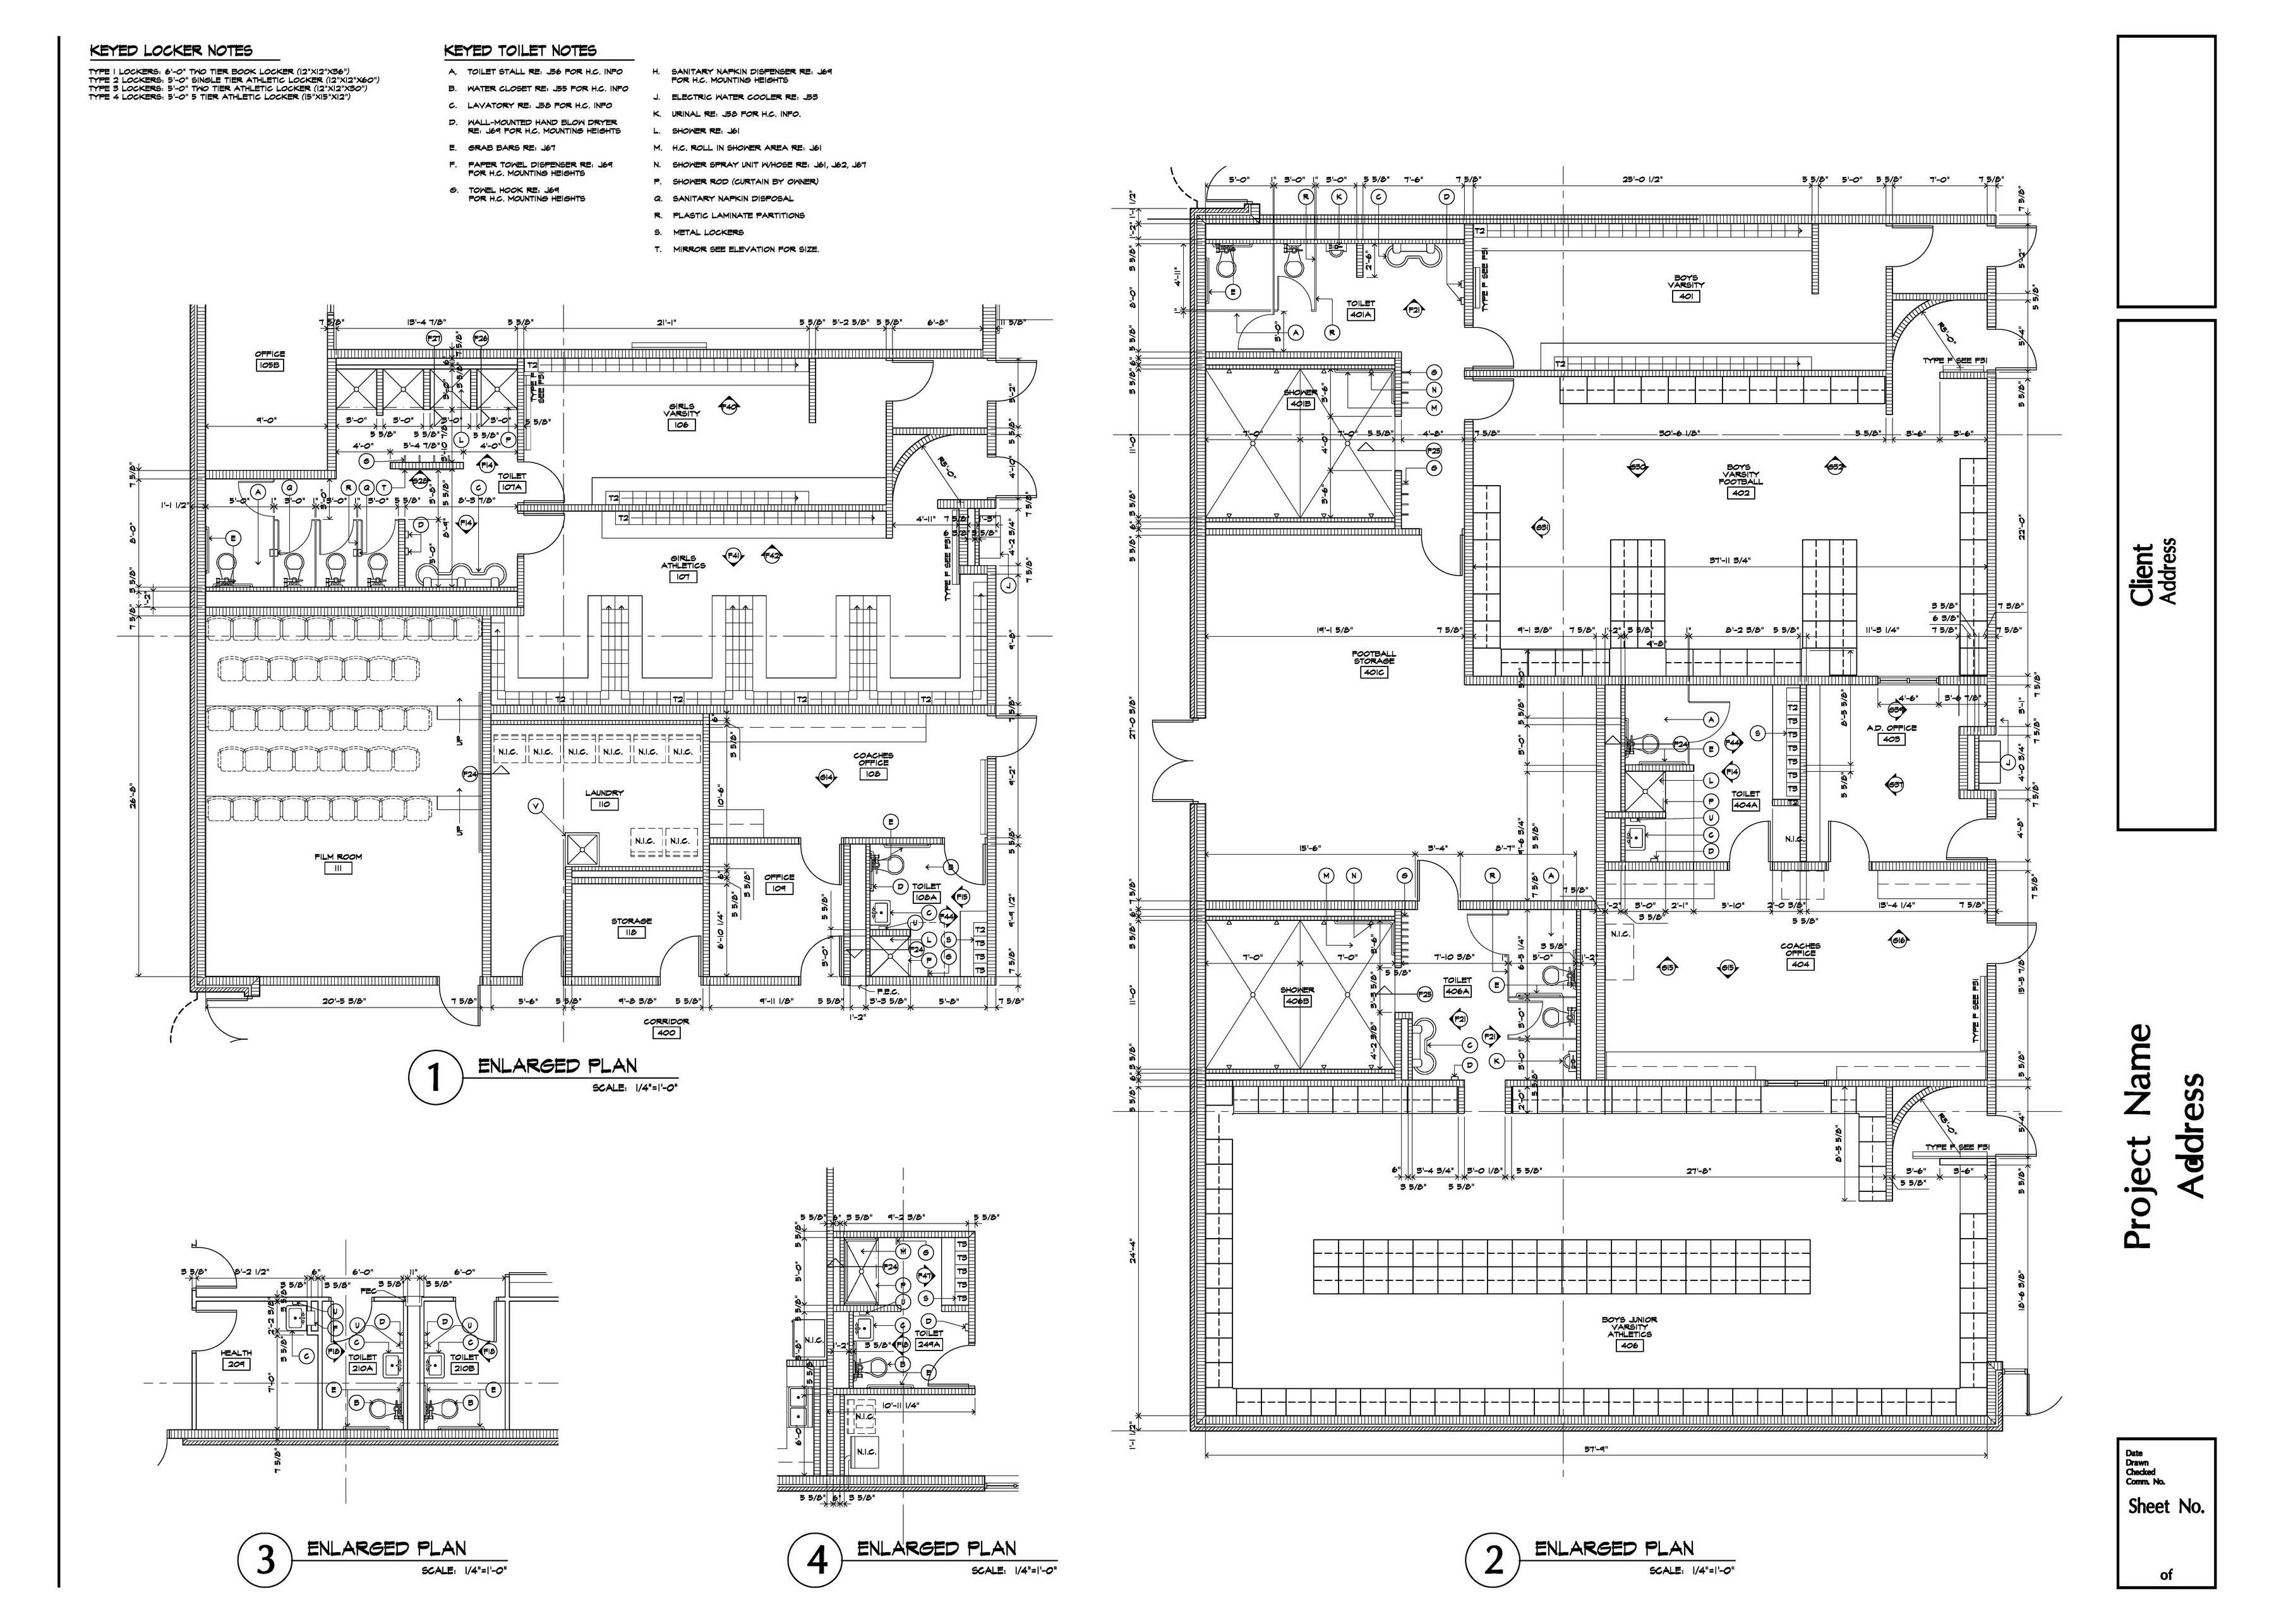 Enlarged Architectural Floor Plan